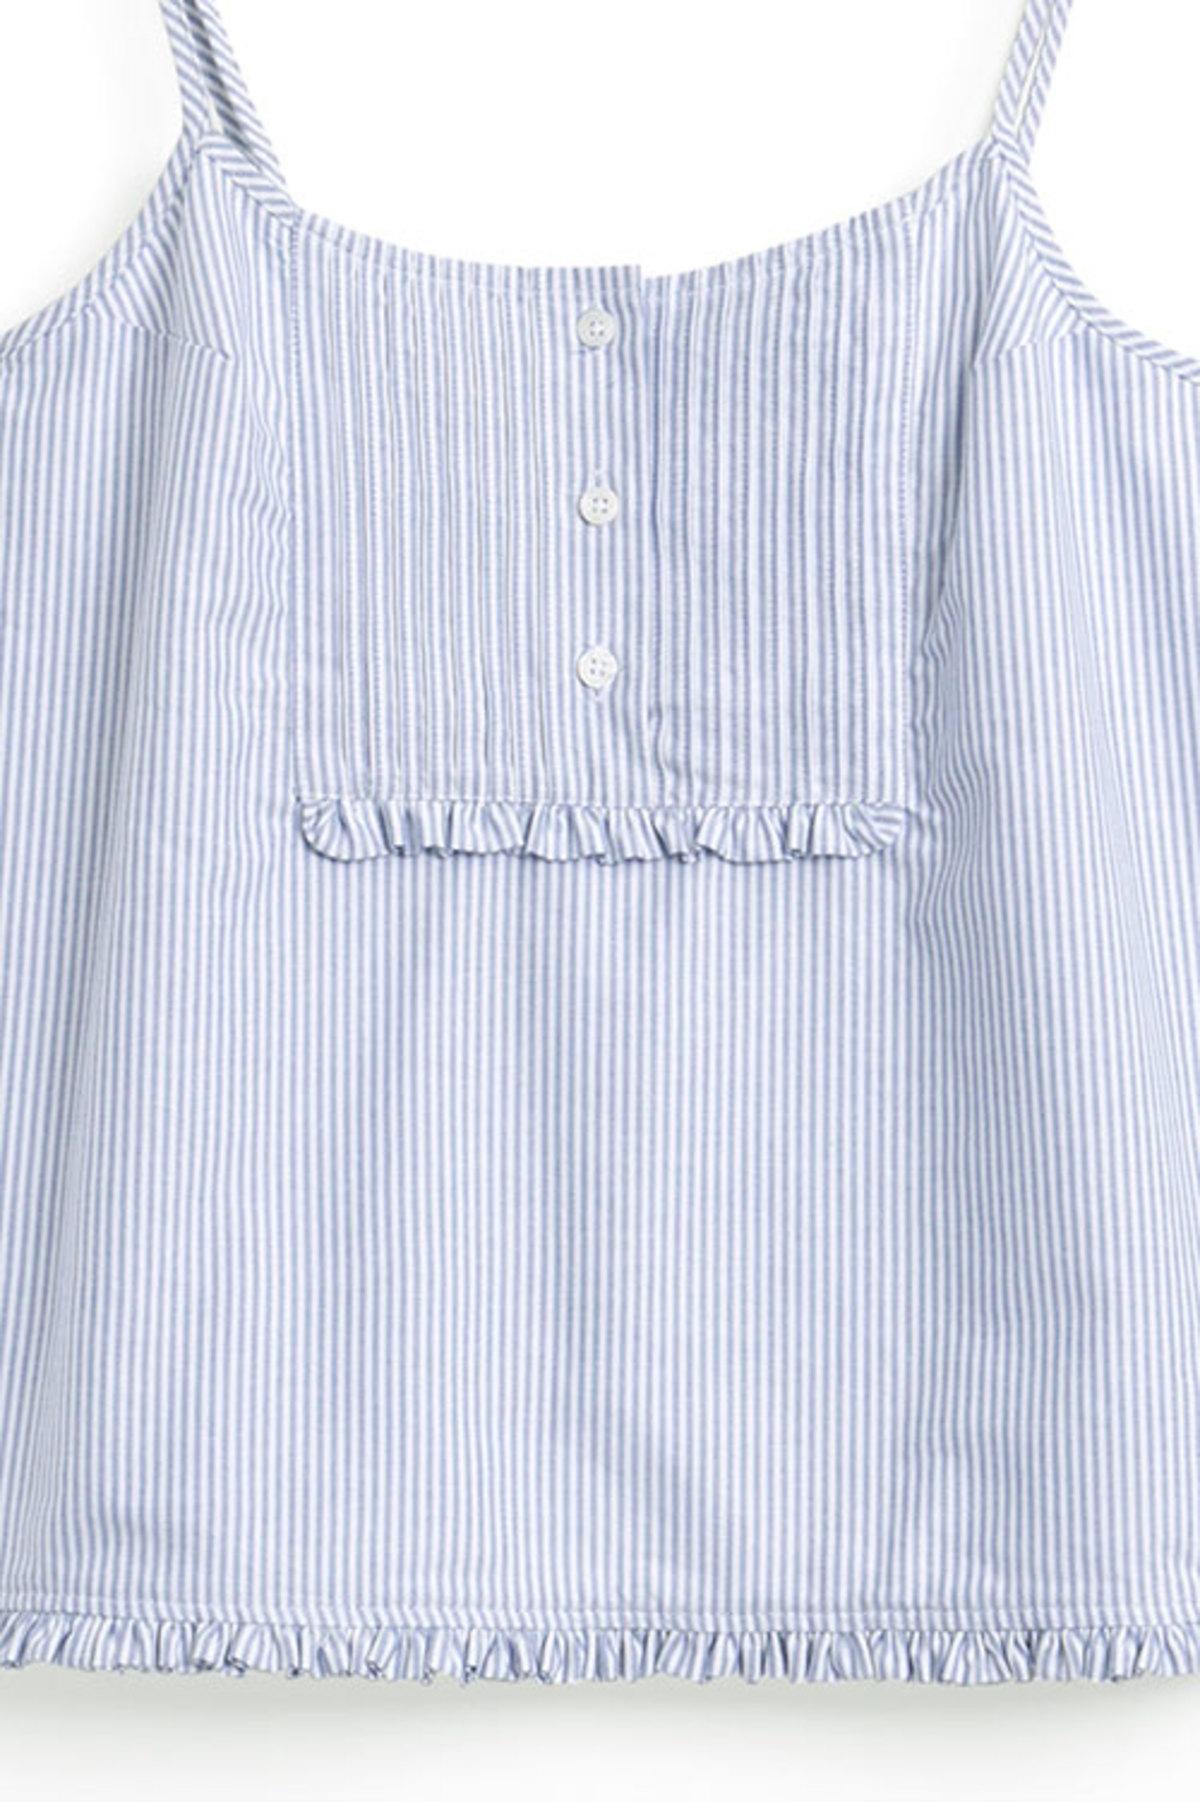 The Sleep Shirt Pink Tuck Camisole Blue Oxford Stripe  e09fae019